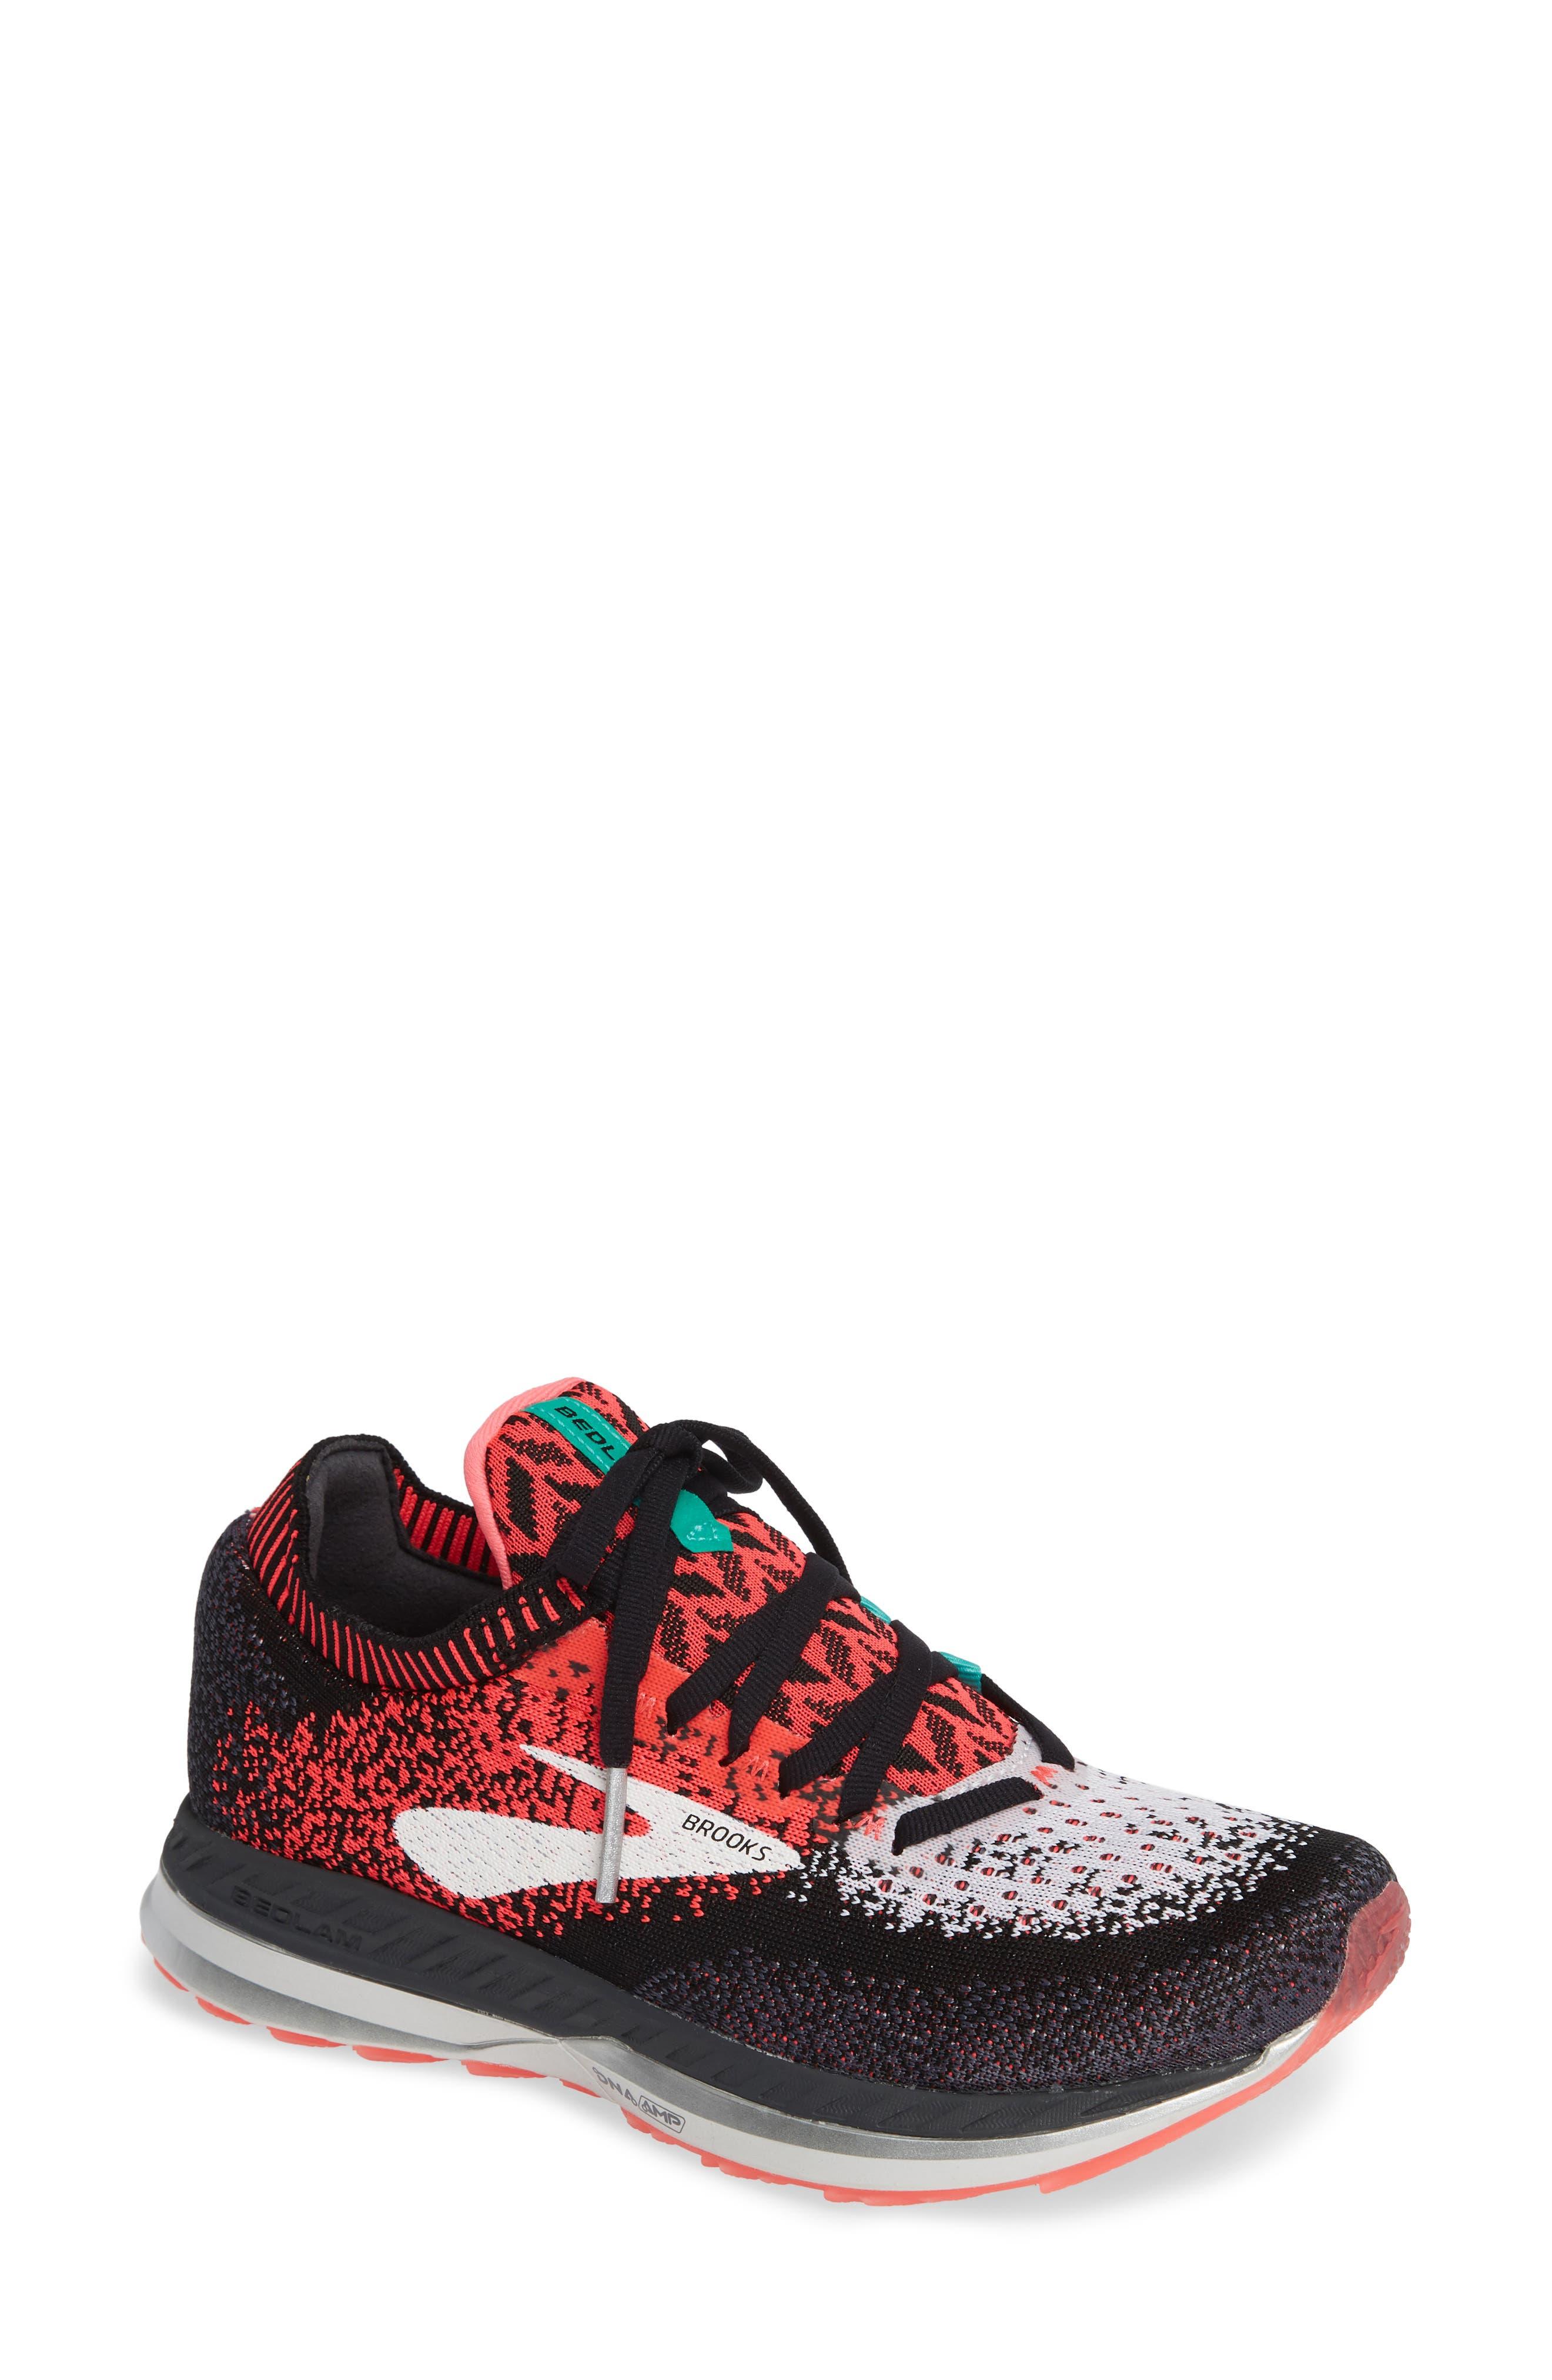 Bedlam Running Shoe, Main, color, PINK/ BLACK/ WHITE